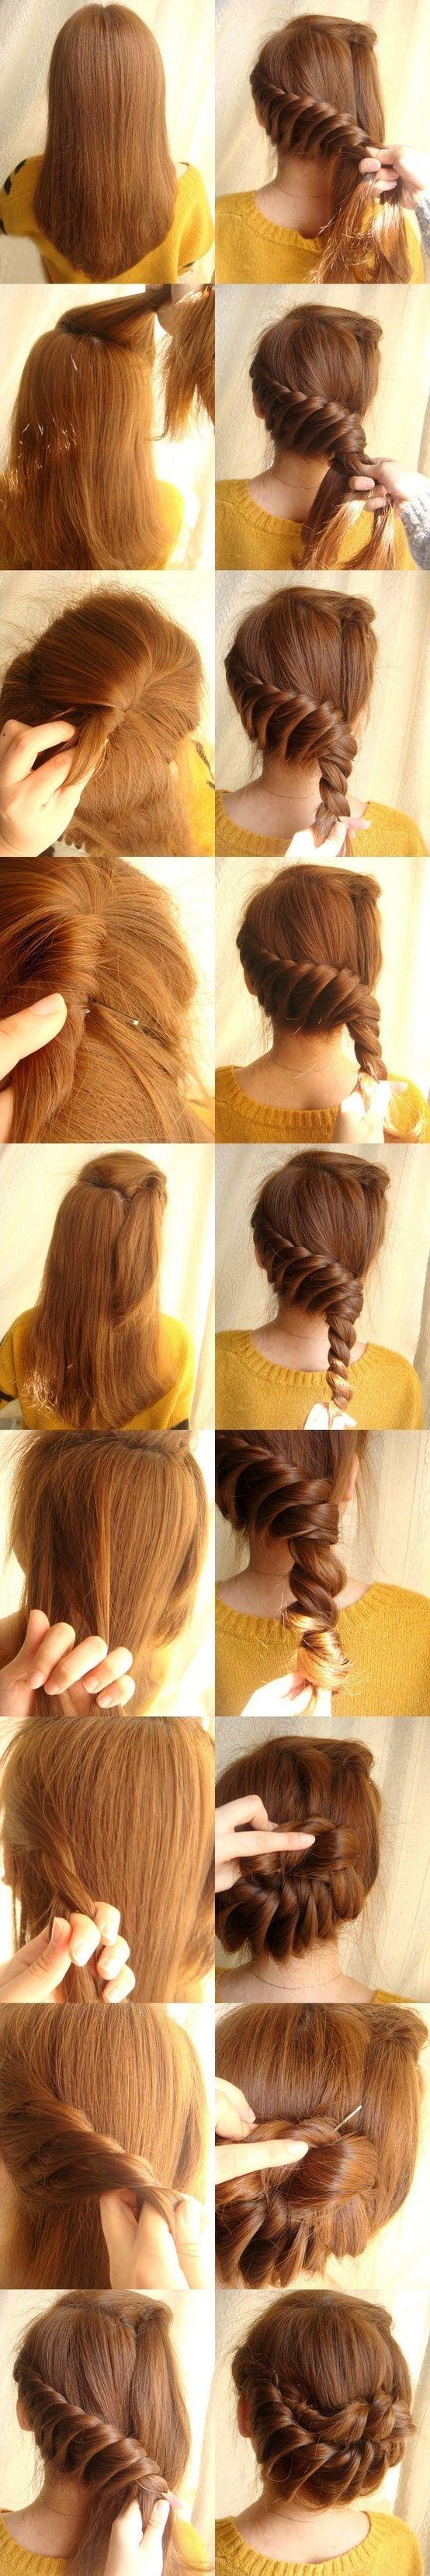 how to make a seashell braid